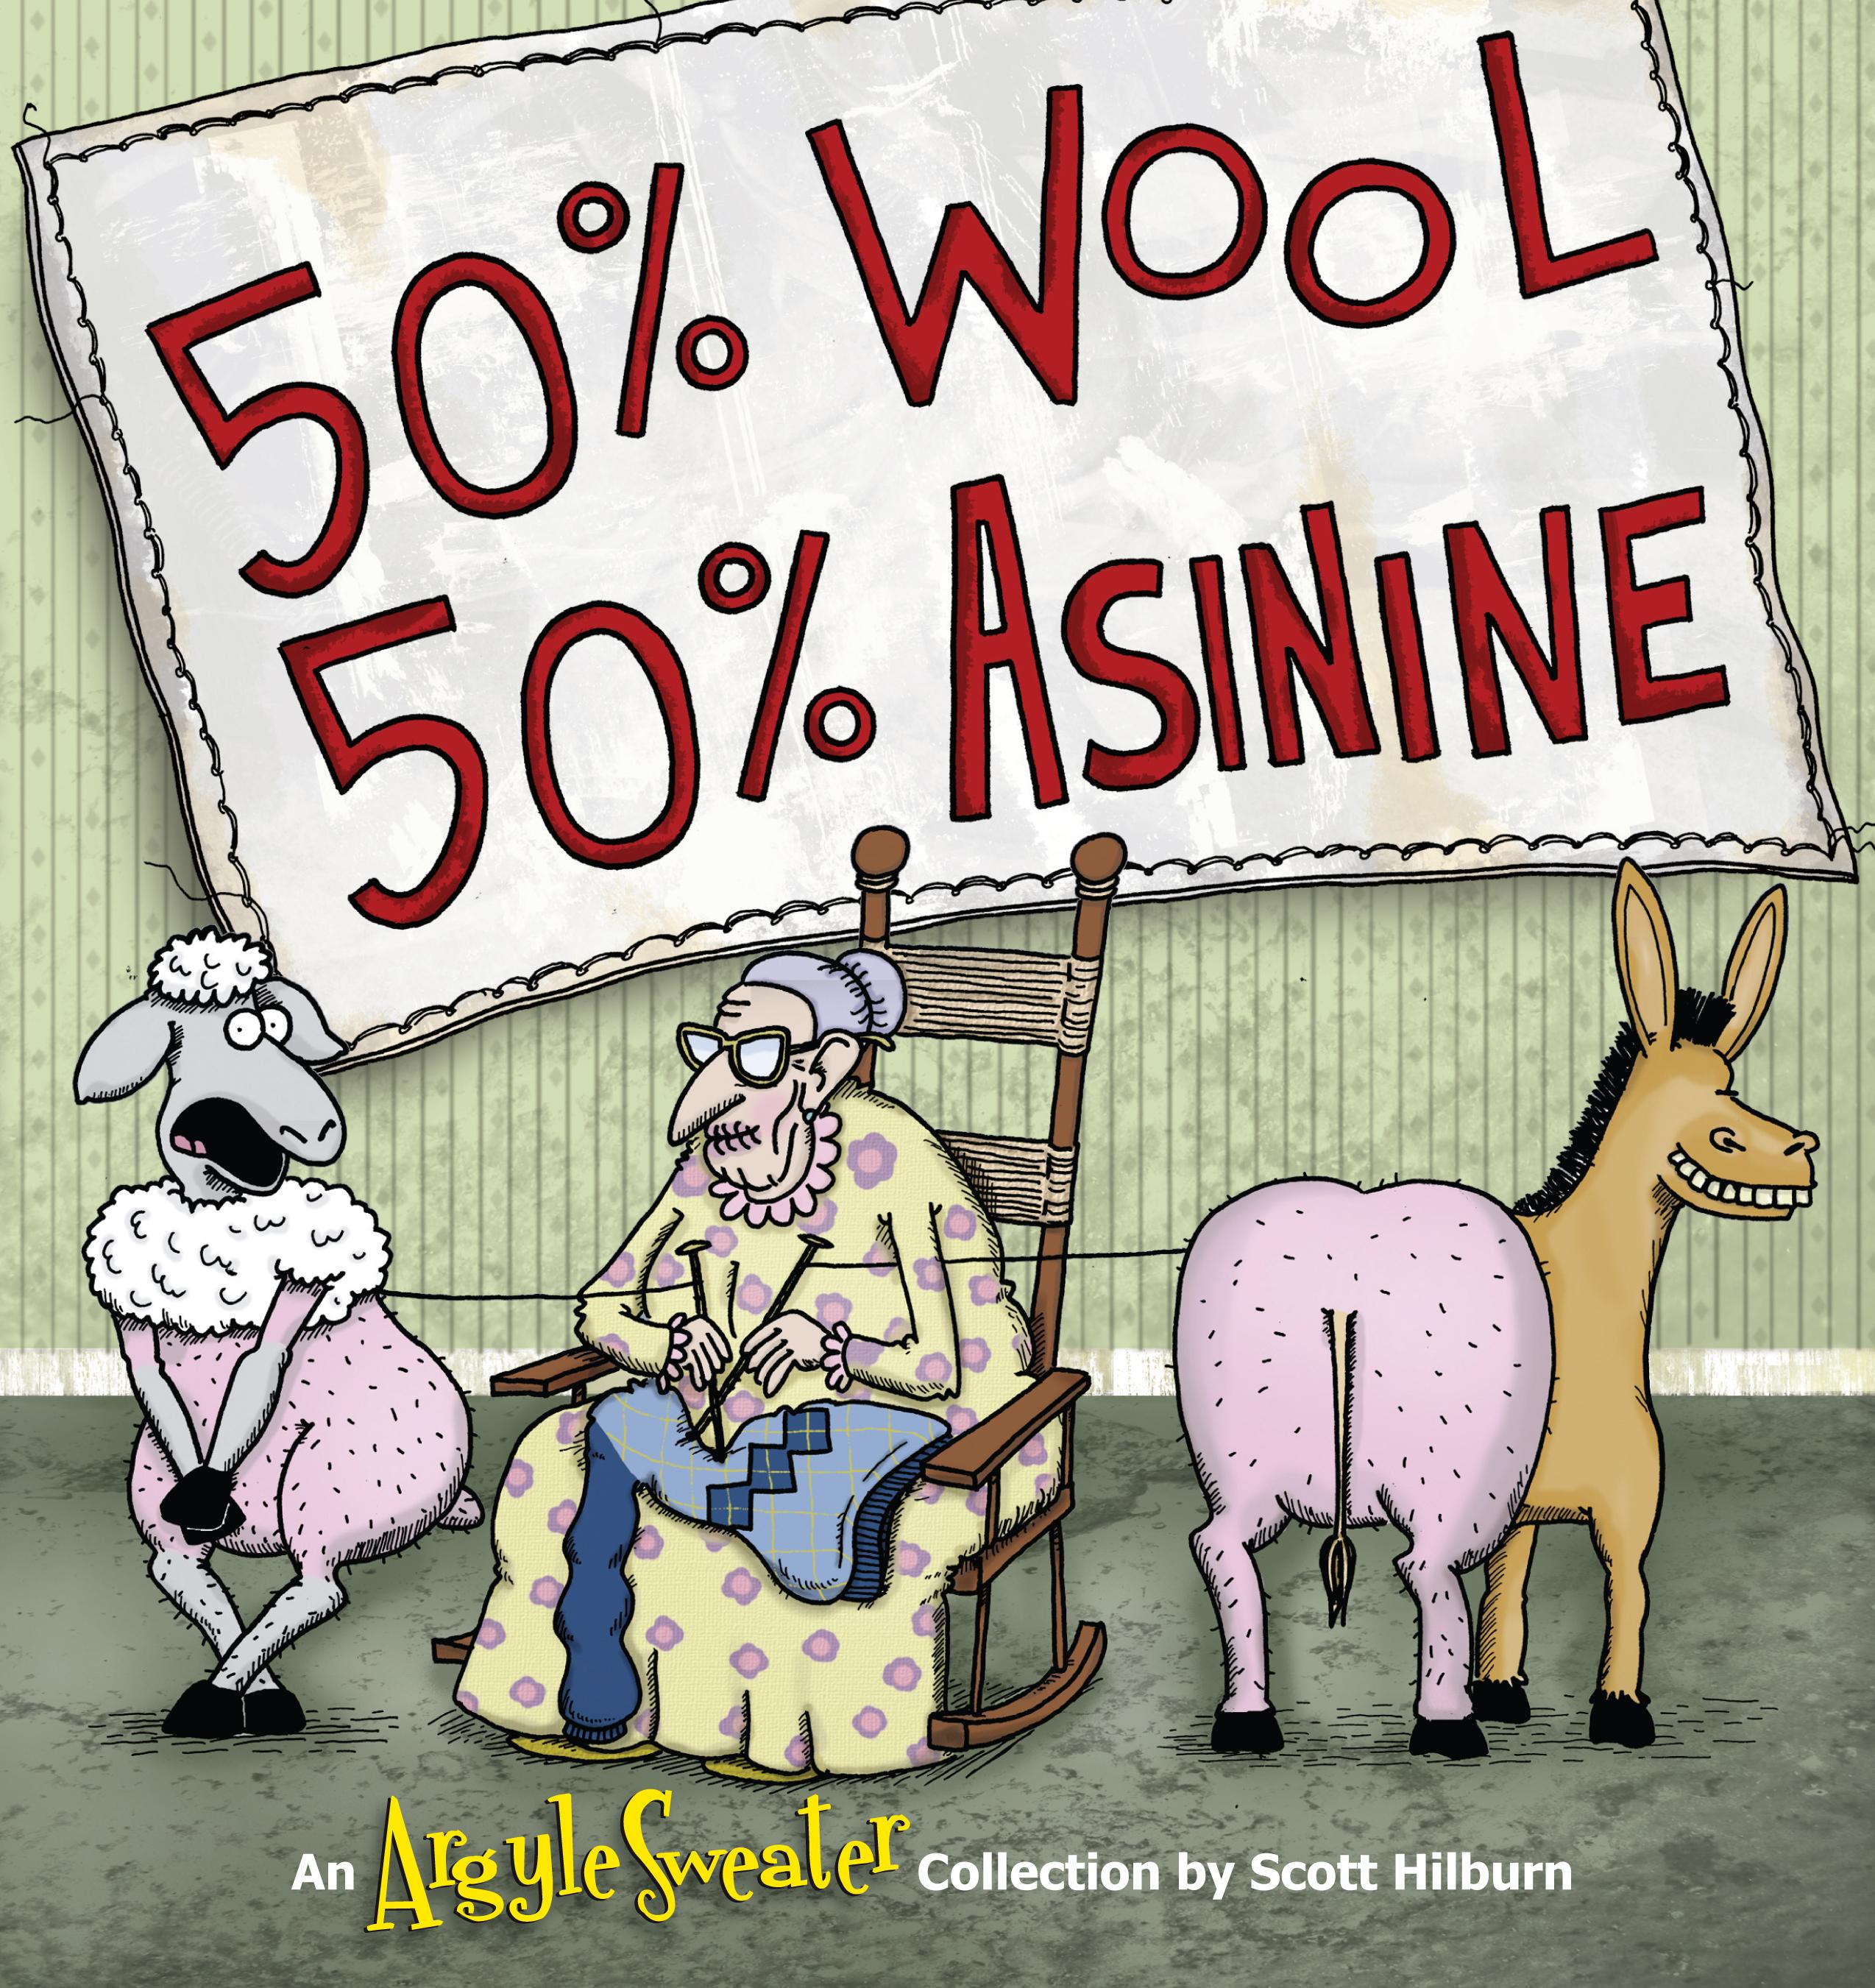 50% Wool, 50% Asinine An Argyle Sweater Collection